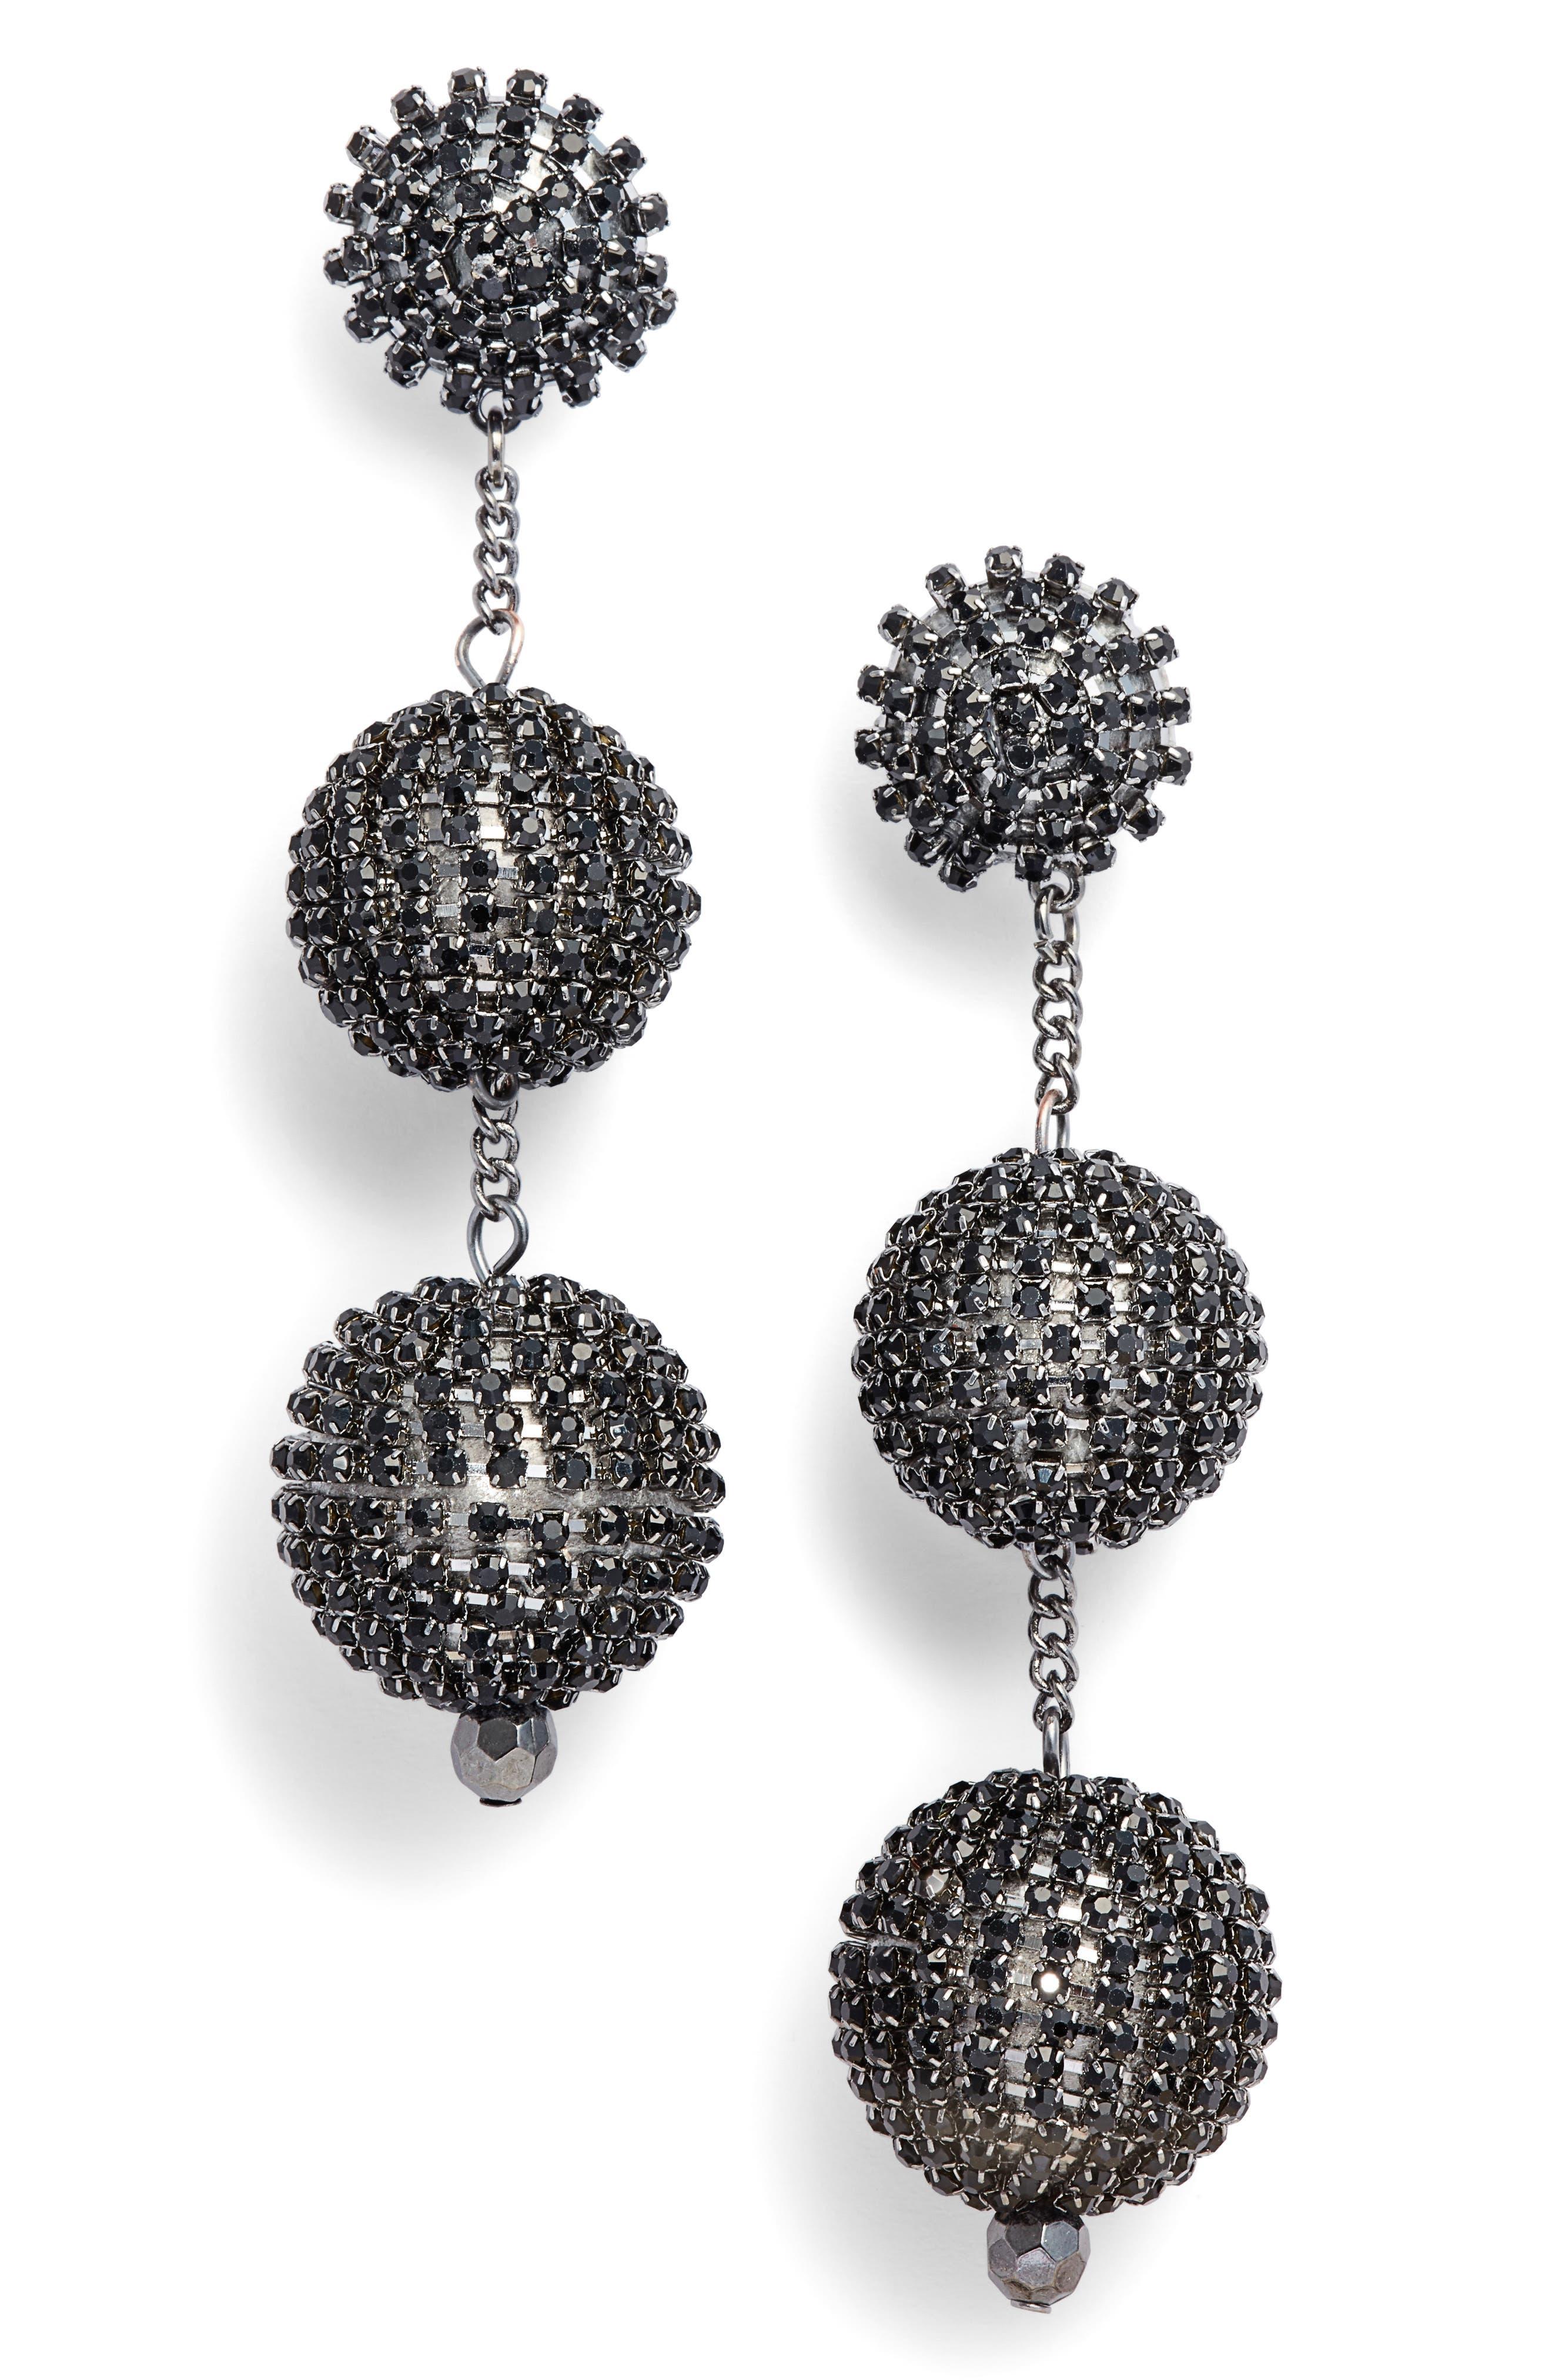 Crystal Ball Drop Earrings,                             Main thumbnail 1, color,                             001